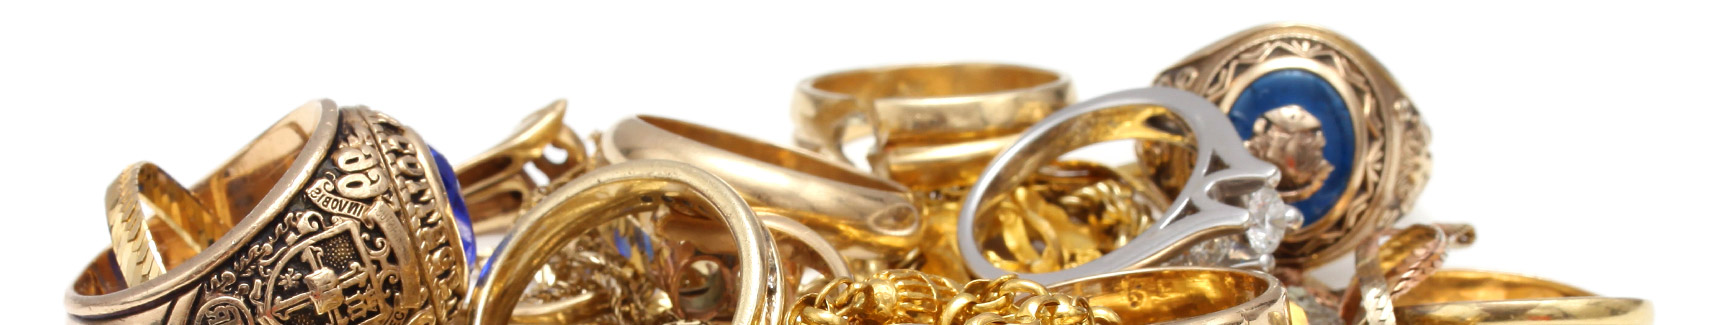 goud inruilen amsterdam